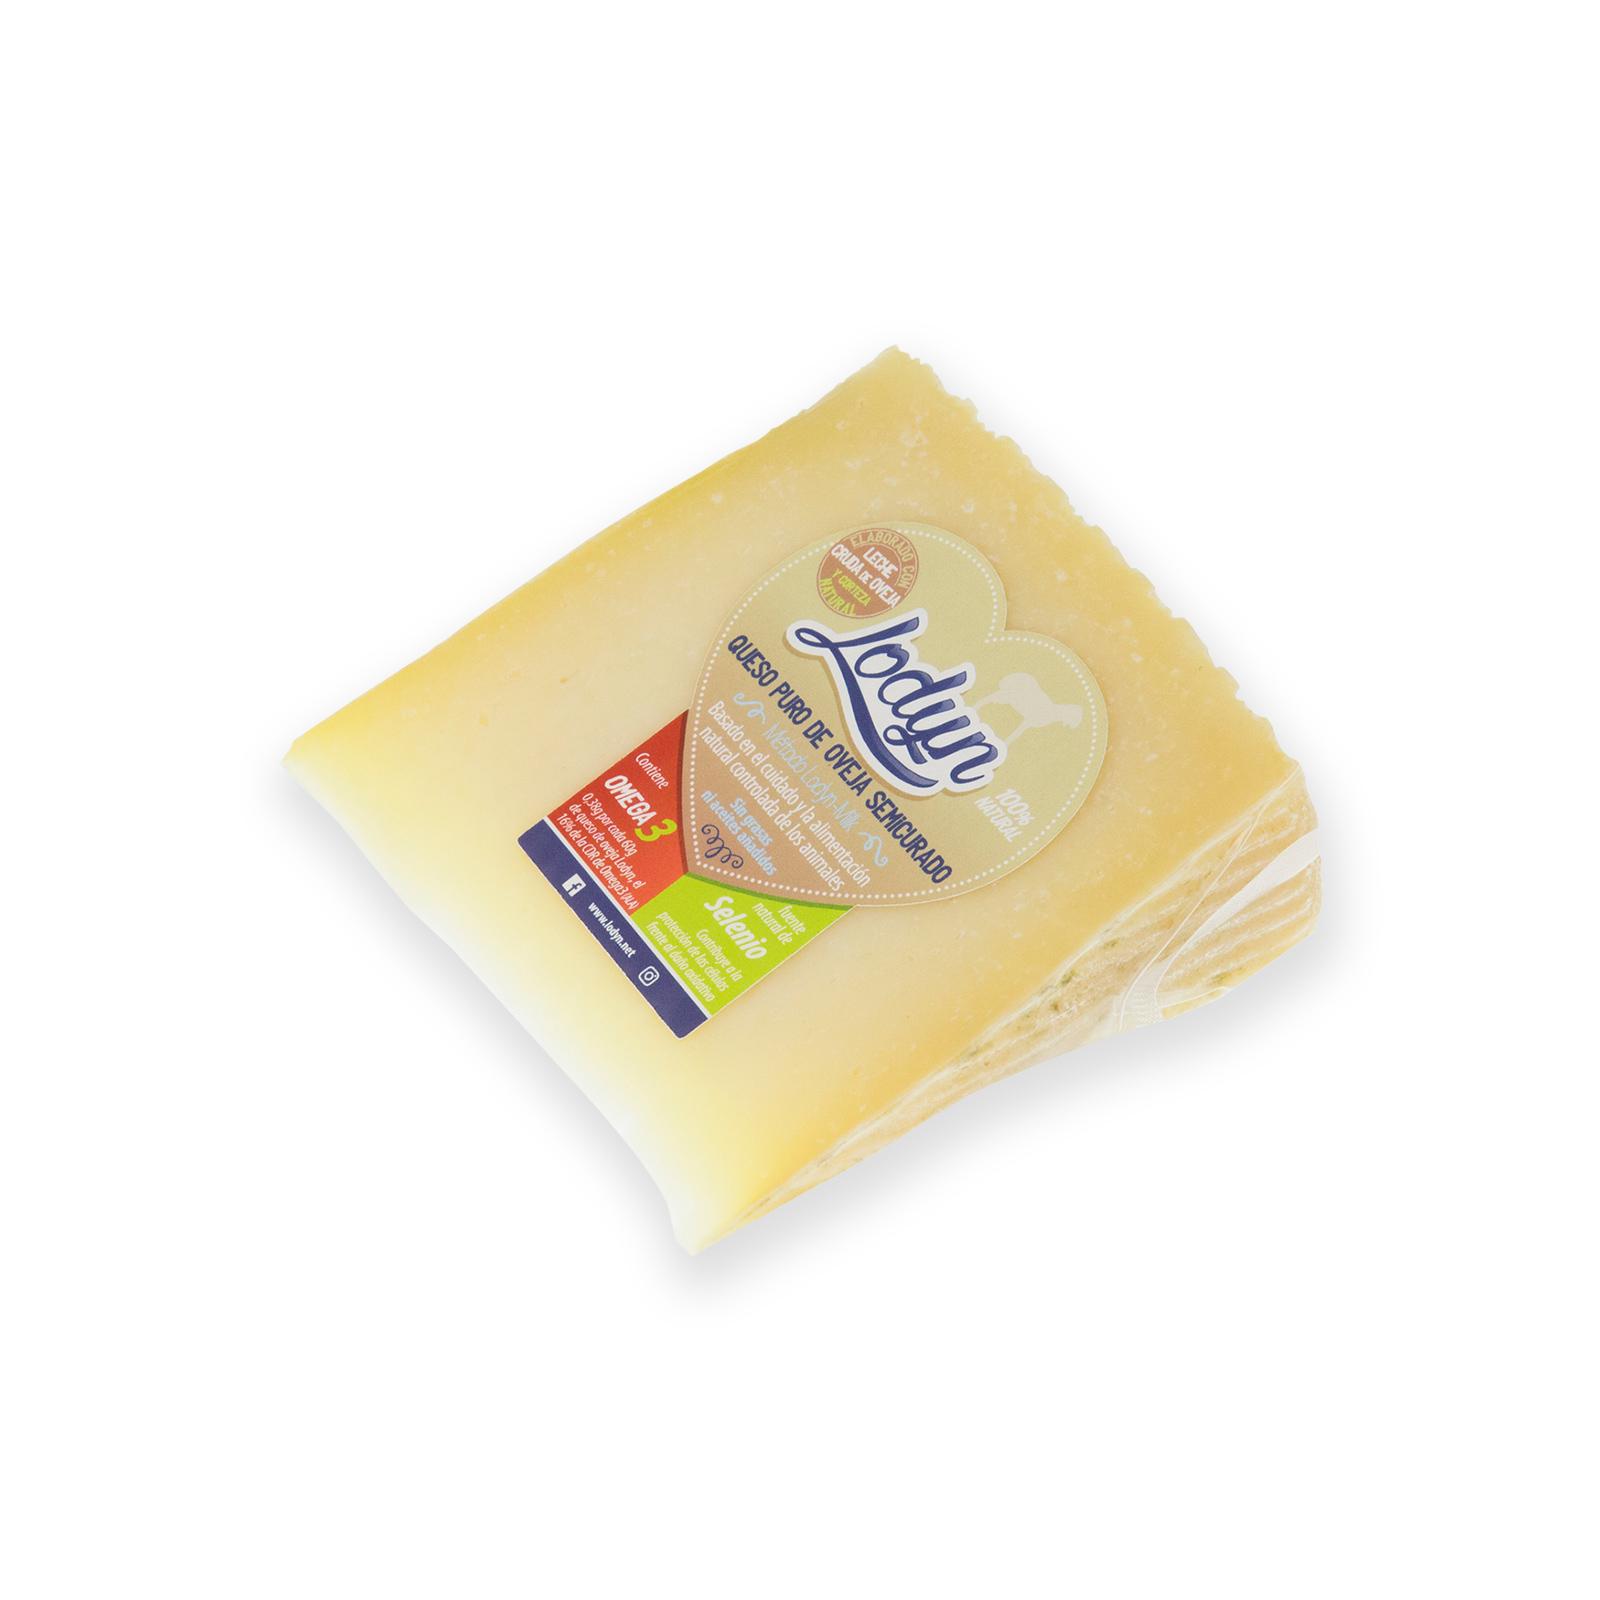 Cuña queso de oveja Lodyn con Omega 3